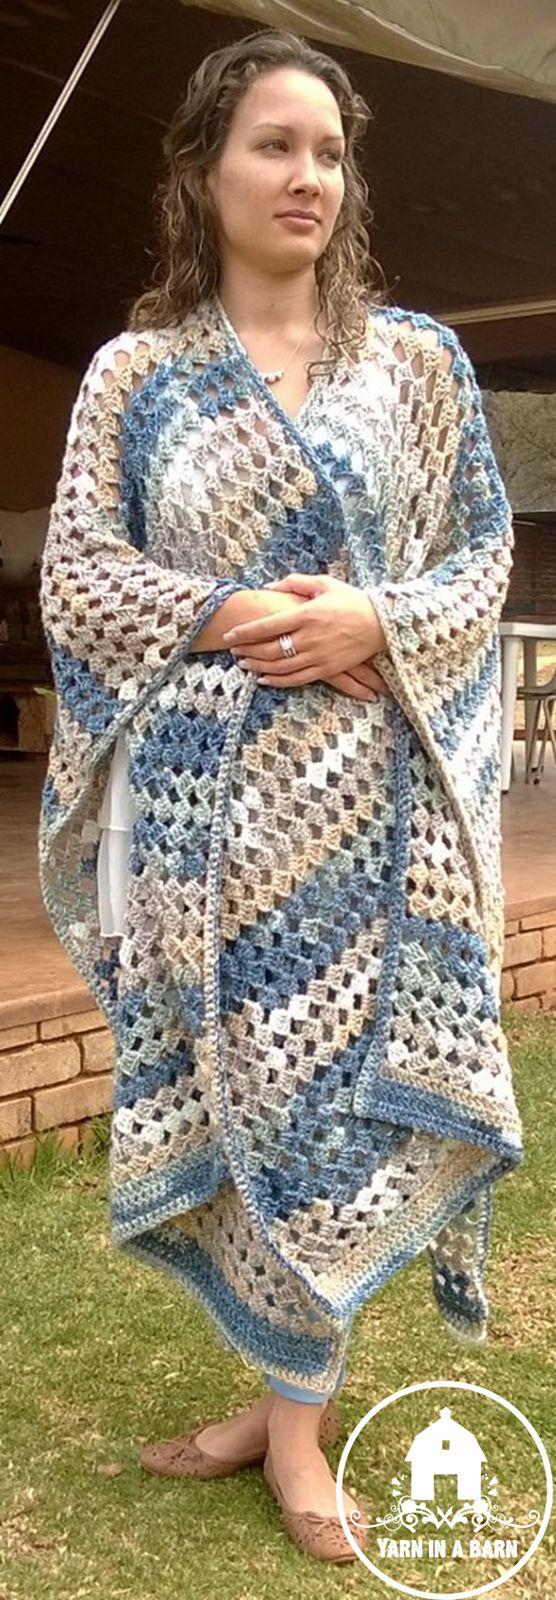 402 best Crochet images on Pinterest   Baby crochet patterns, Baby ...